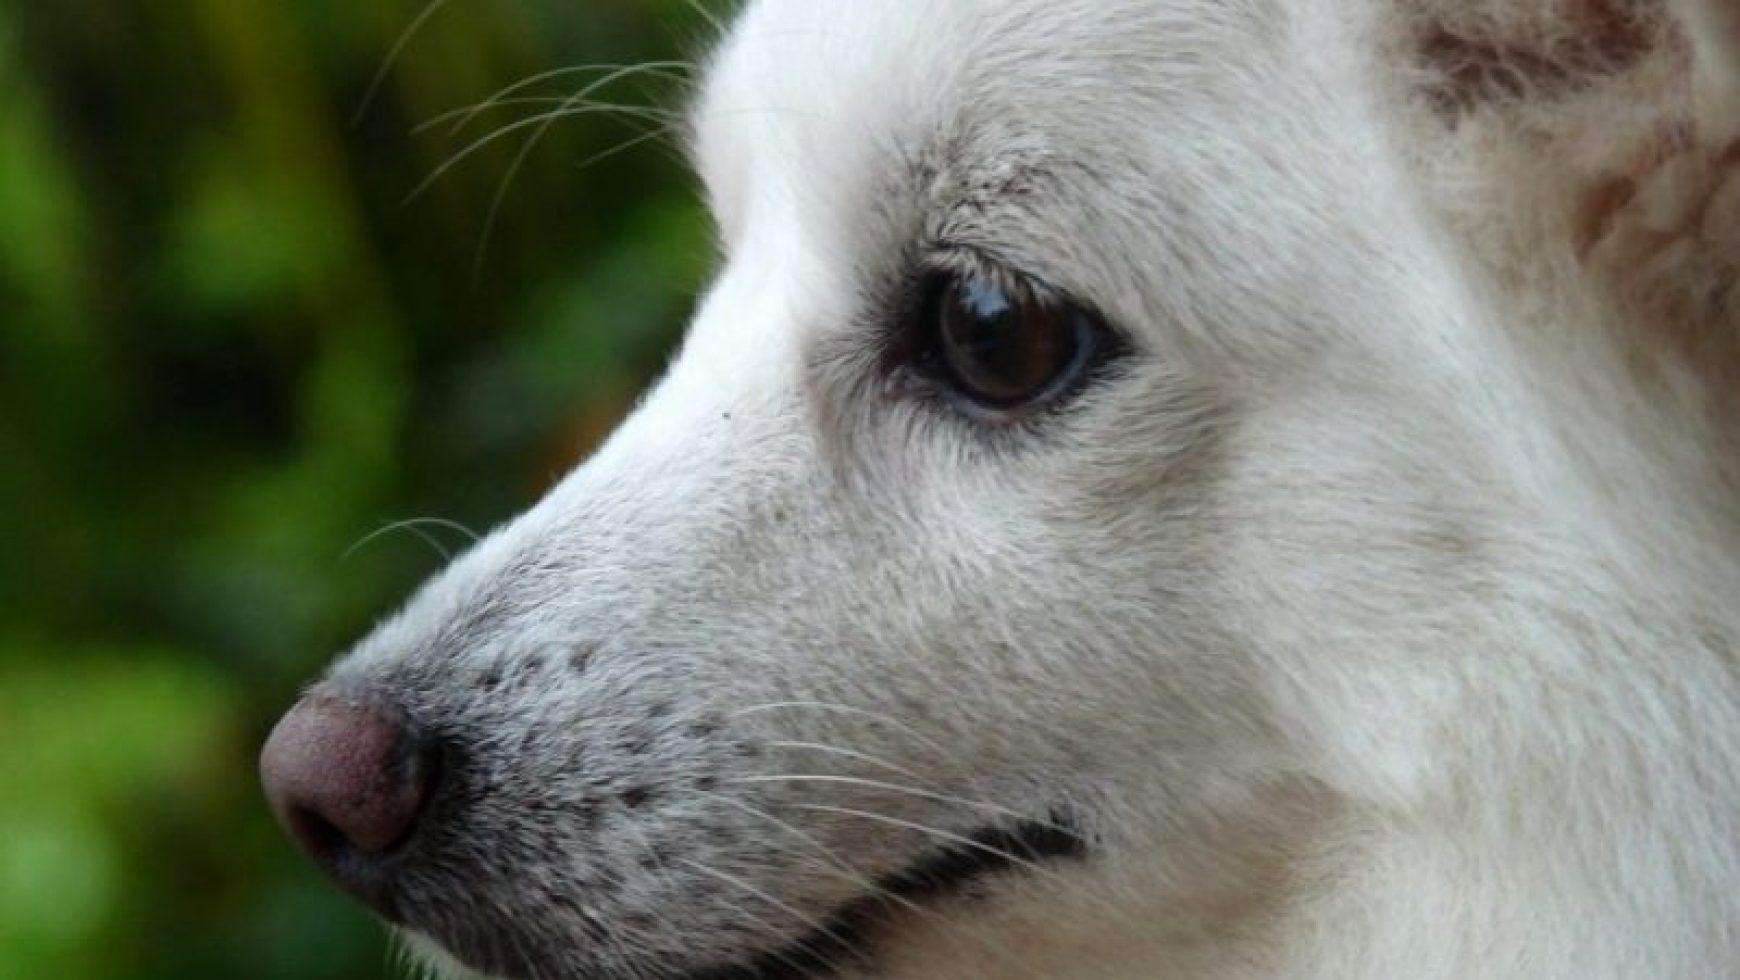 Bladder Cancer in Dogs